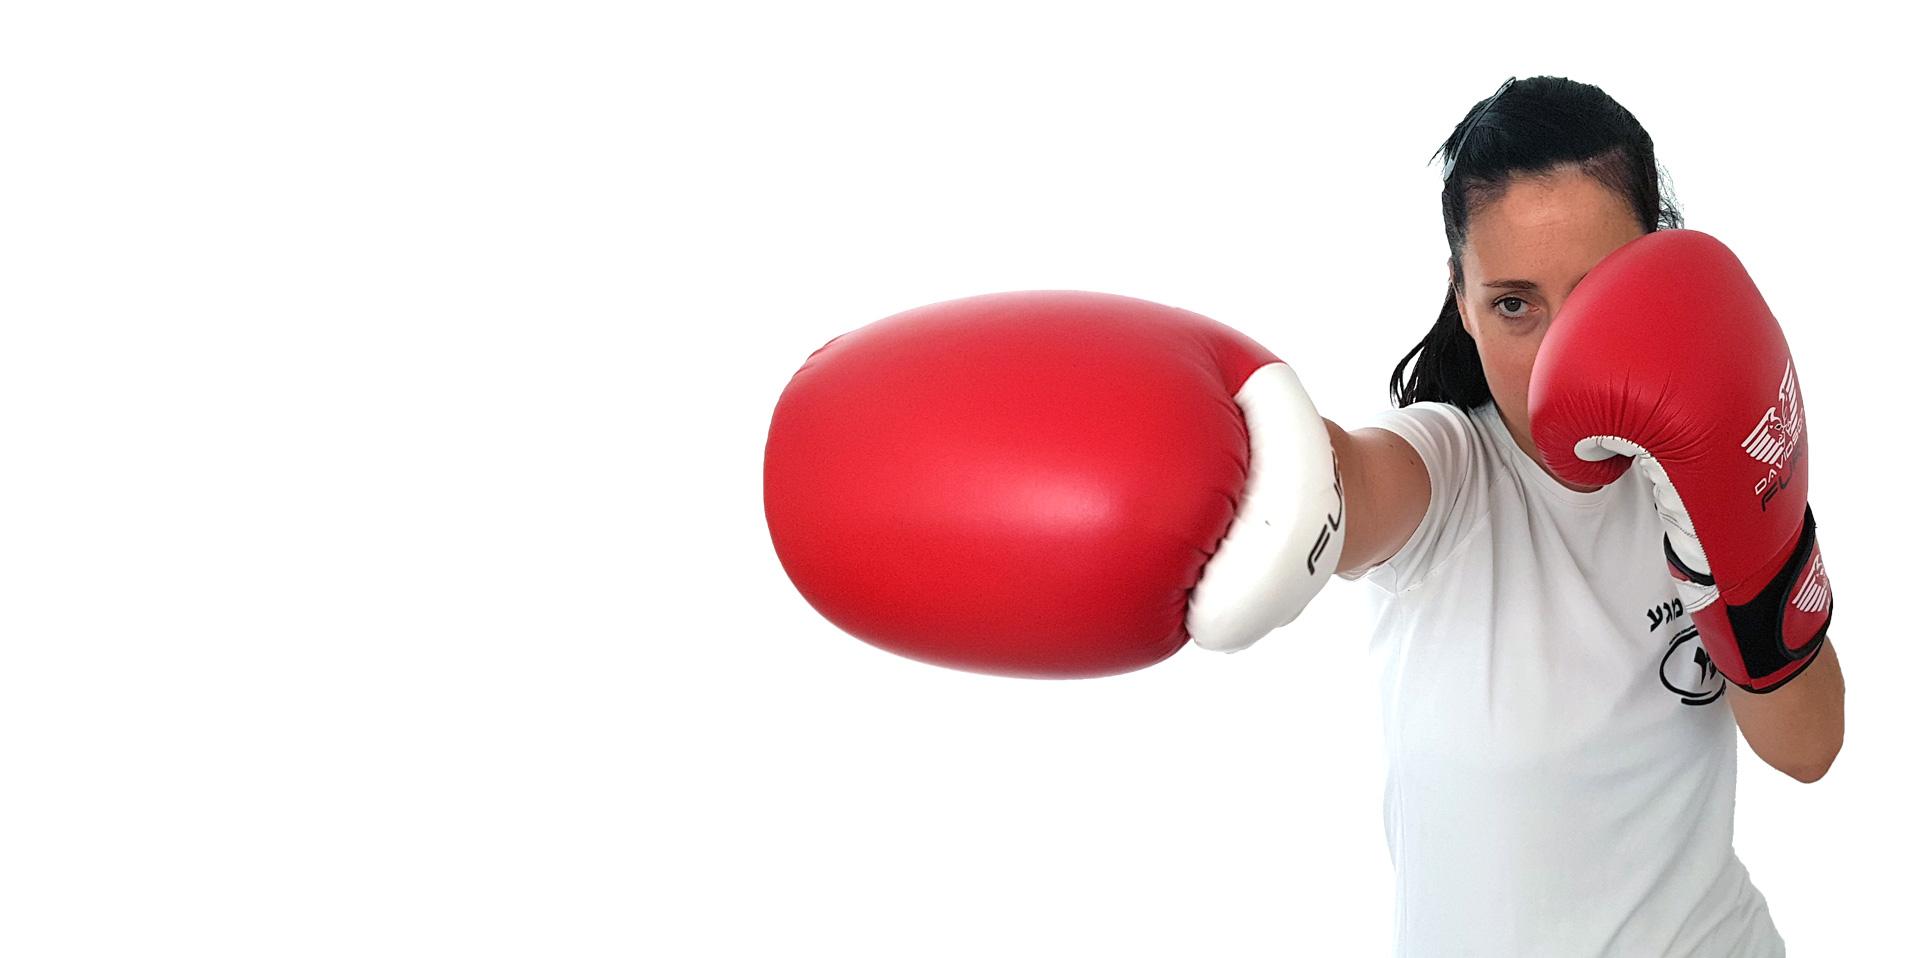 kravmaga self-defense paris paris15 paris06 leperreux